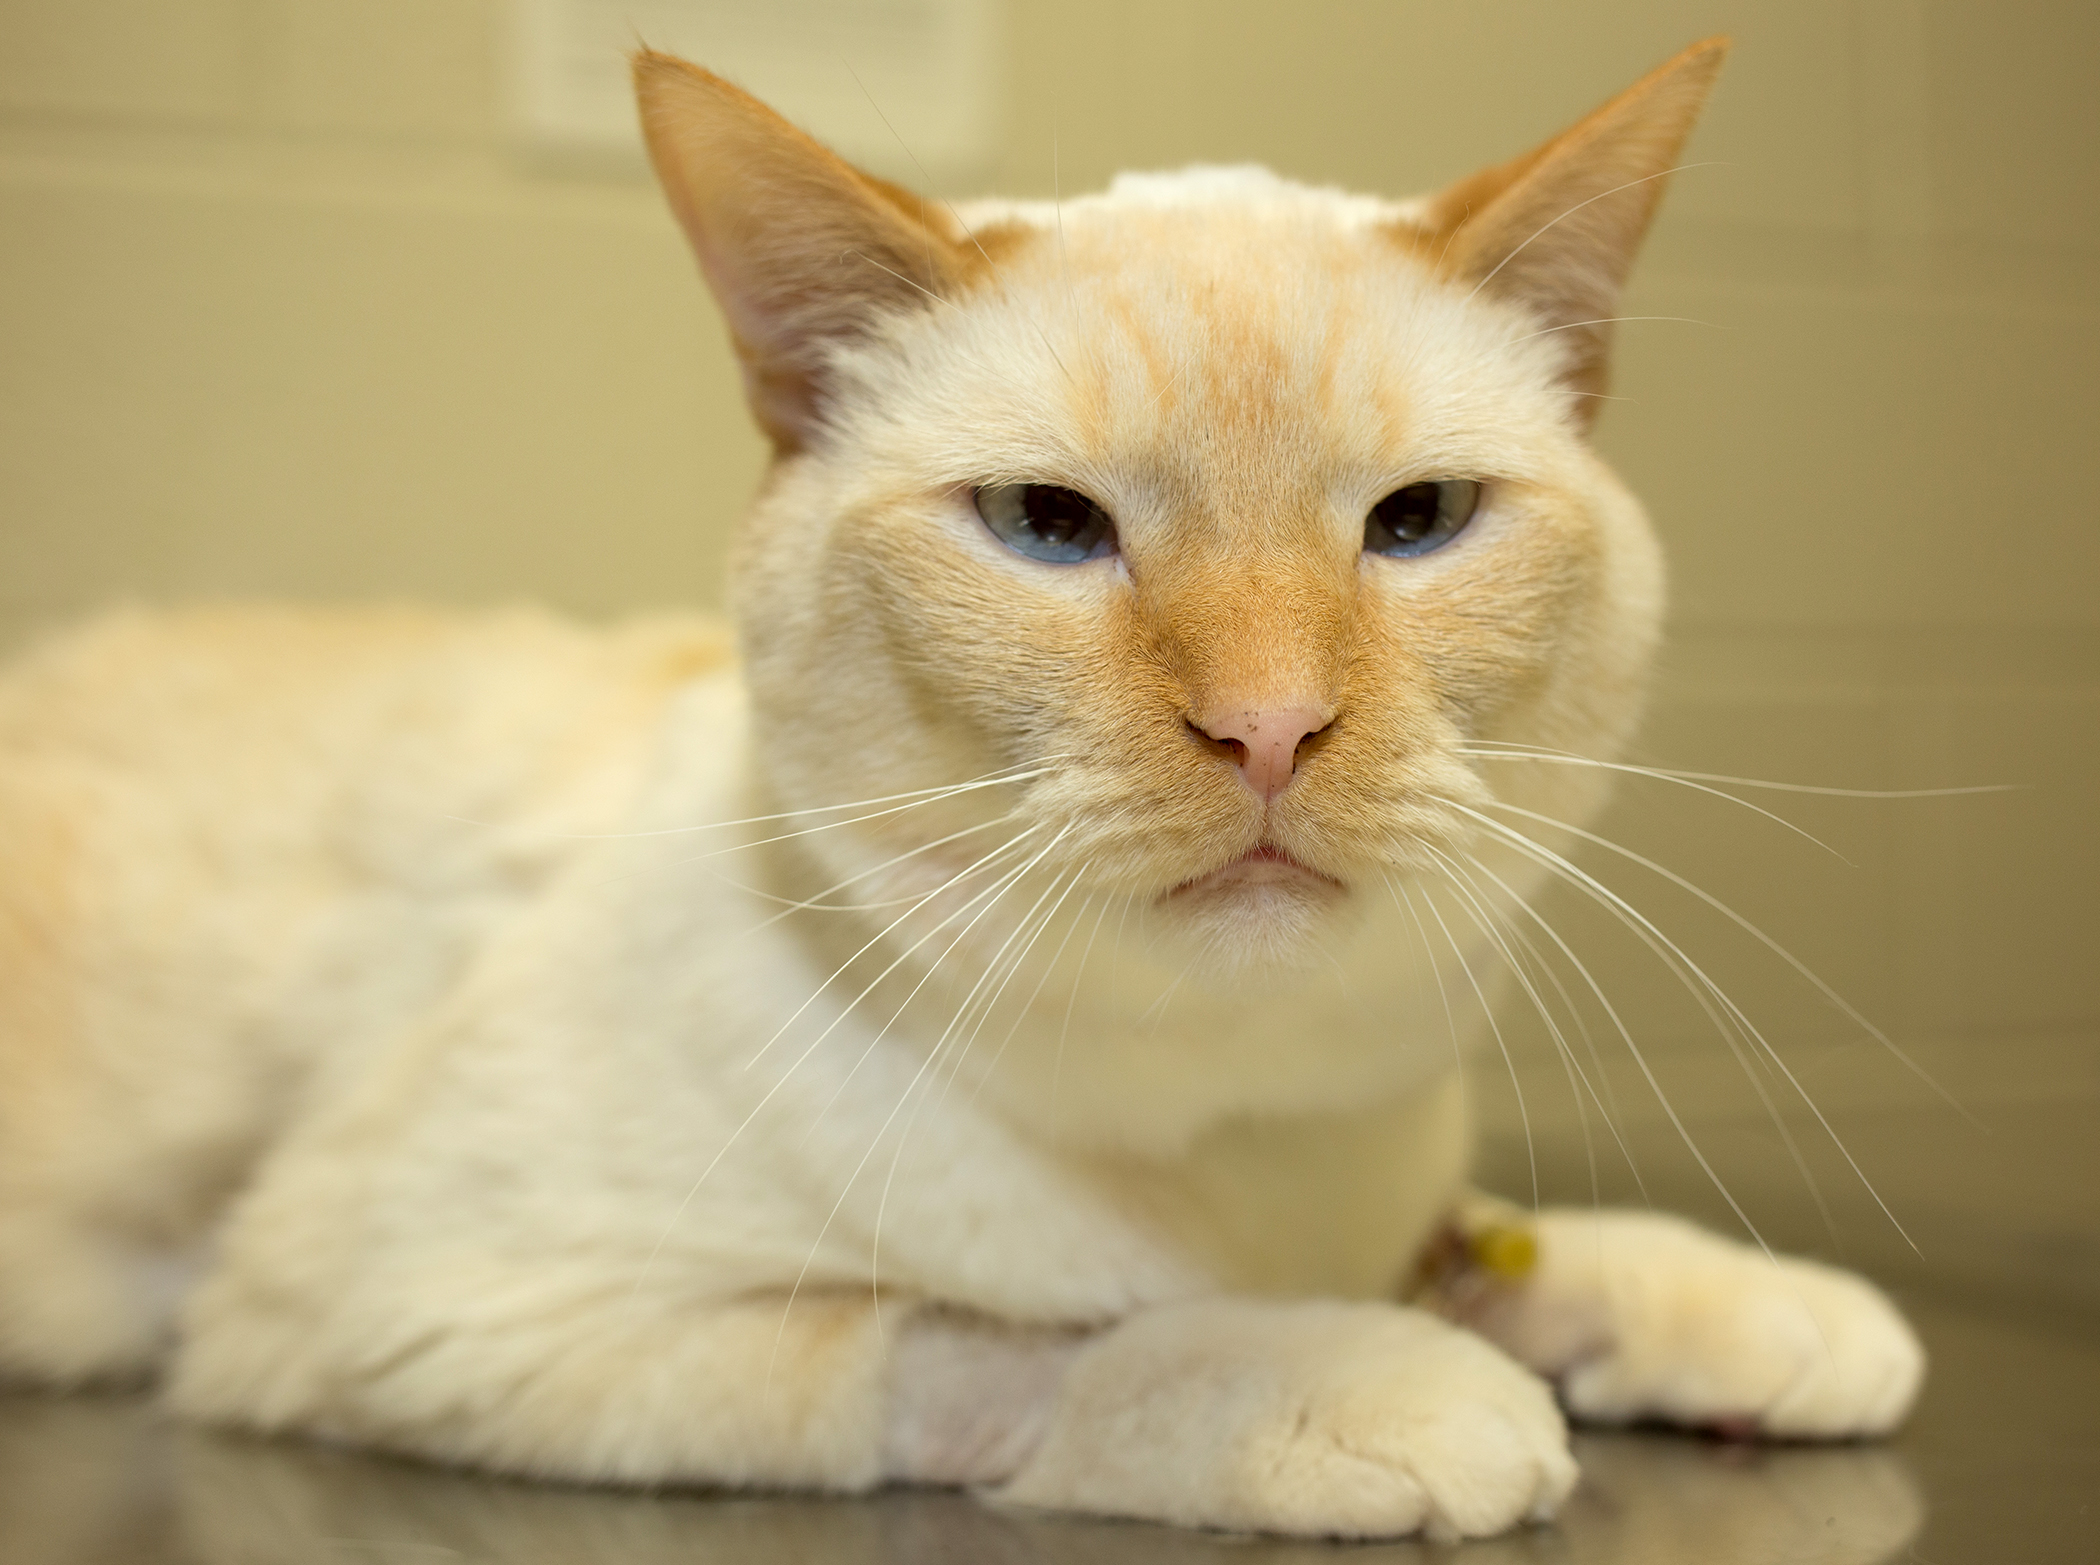 Veterinary surgeons use feline adult stem cells in kidney ...